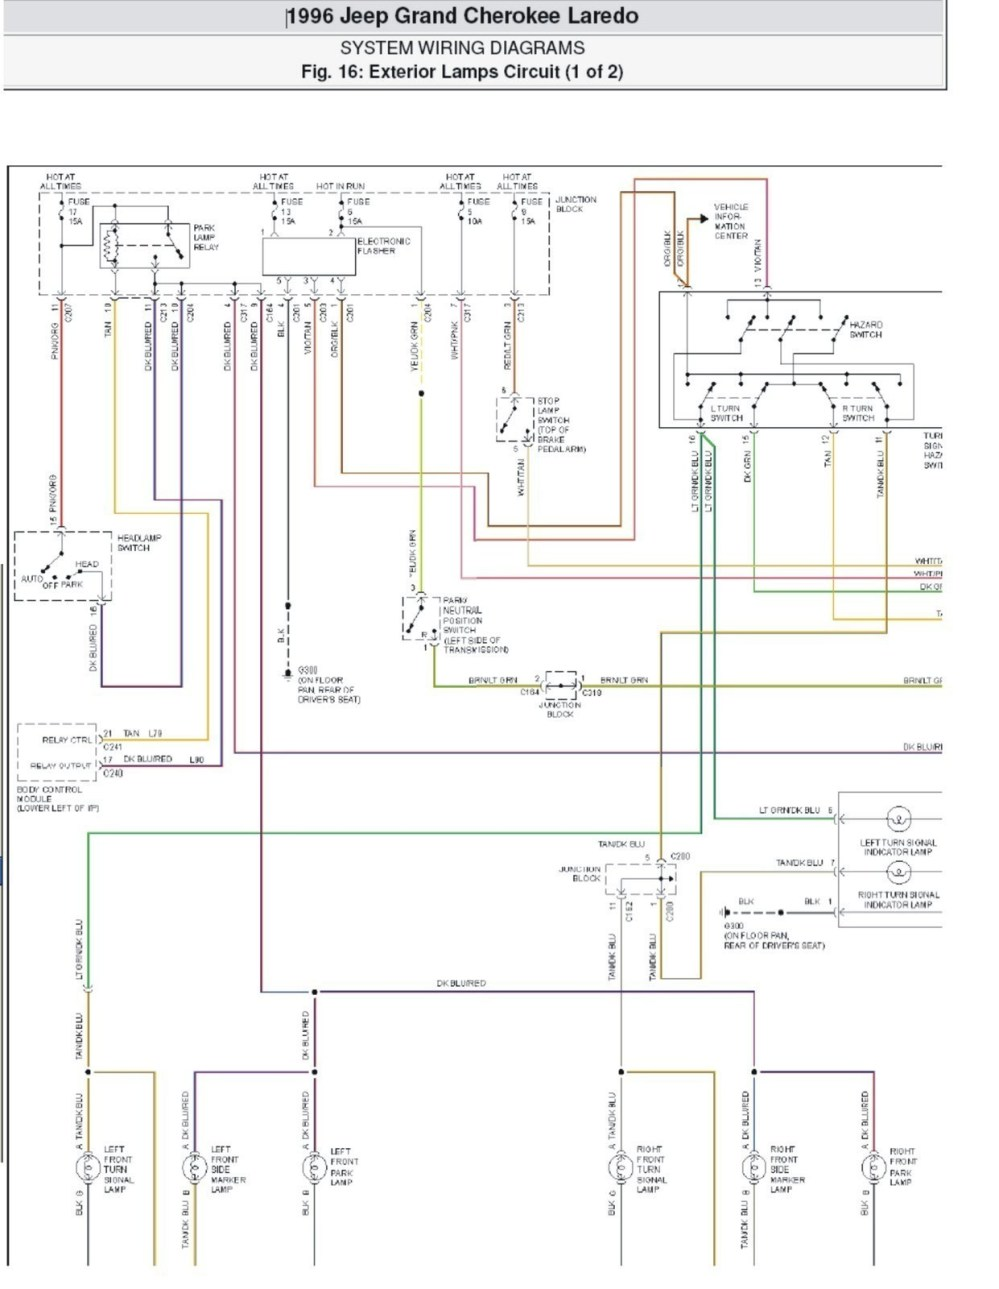 medium resolution of 2000 jeep grand cherokee trailer wiring diagram simple trailer wiring diagram 94 jeep grand cherokee valid